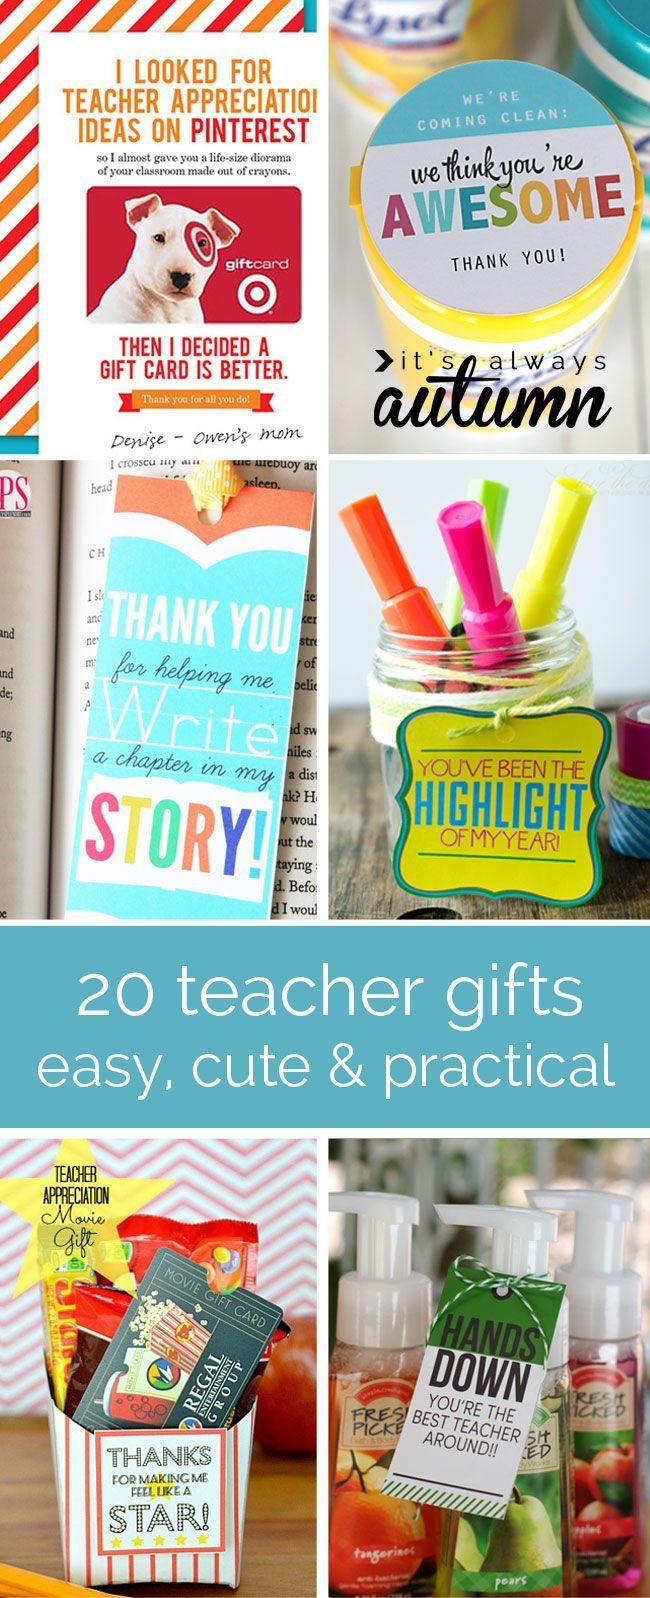 Scrapbook ideas for teachers - 20 Cheap Easy Cute Practical Teacher Appreciation Gifts